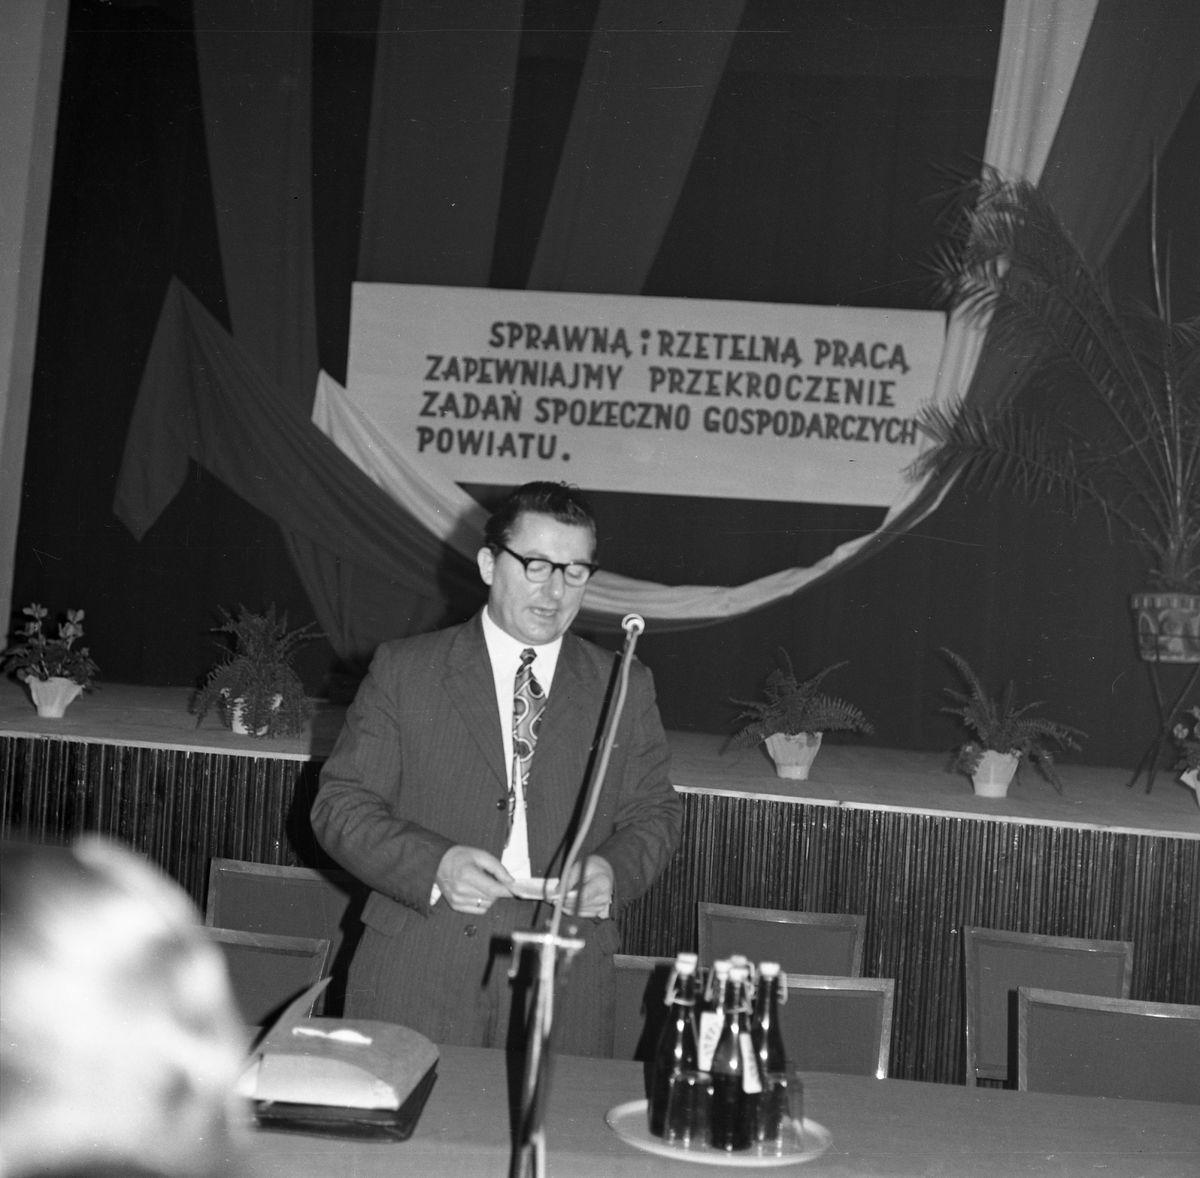 Spotkanie partyjne, 1974 r. [9]